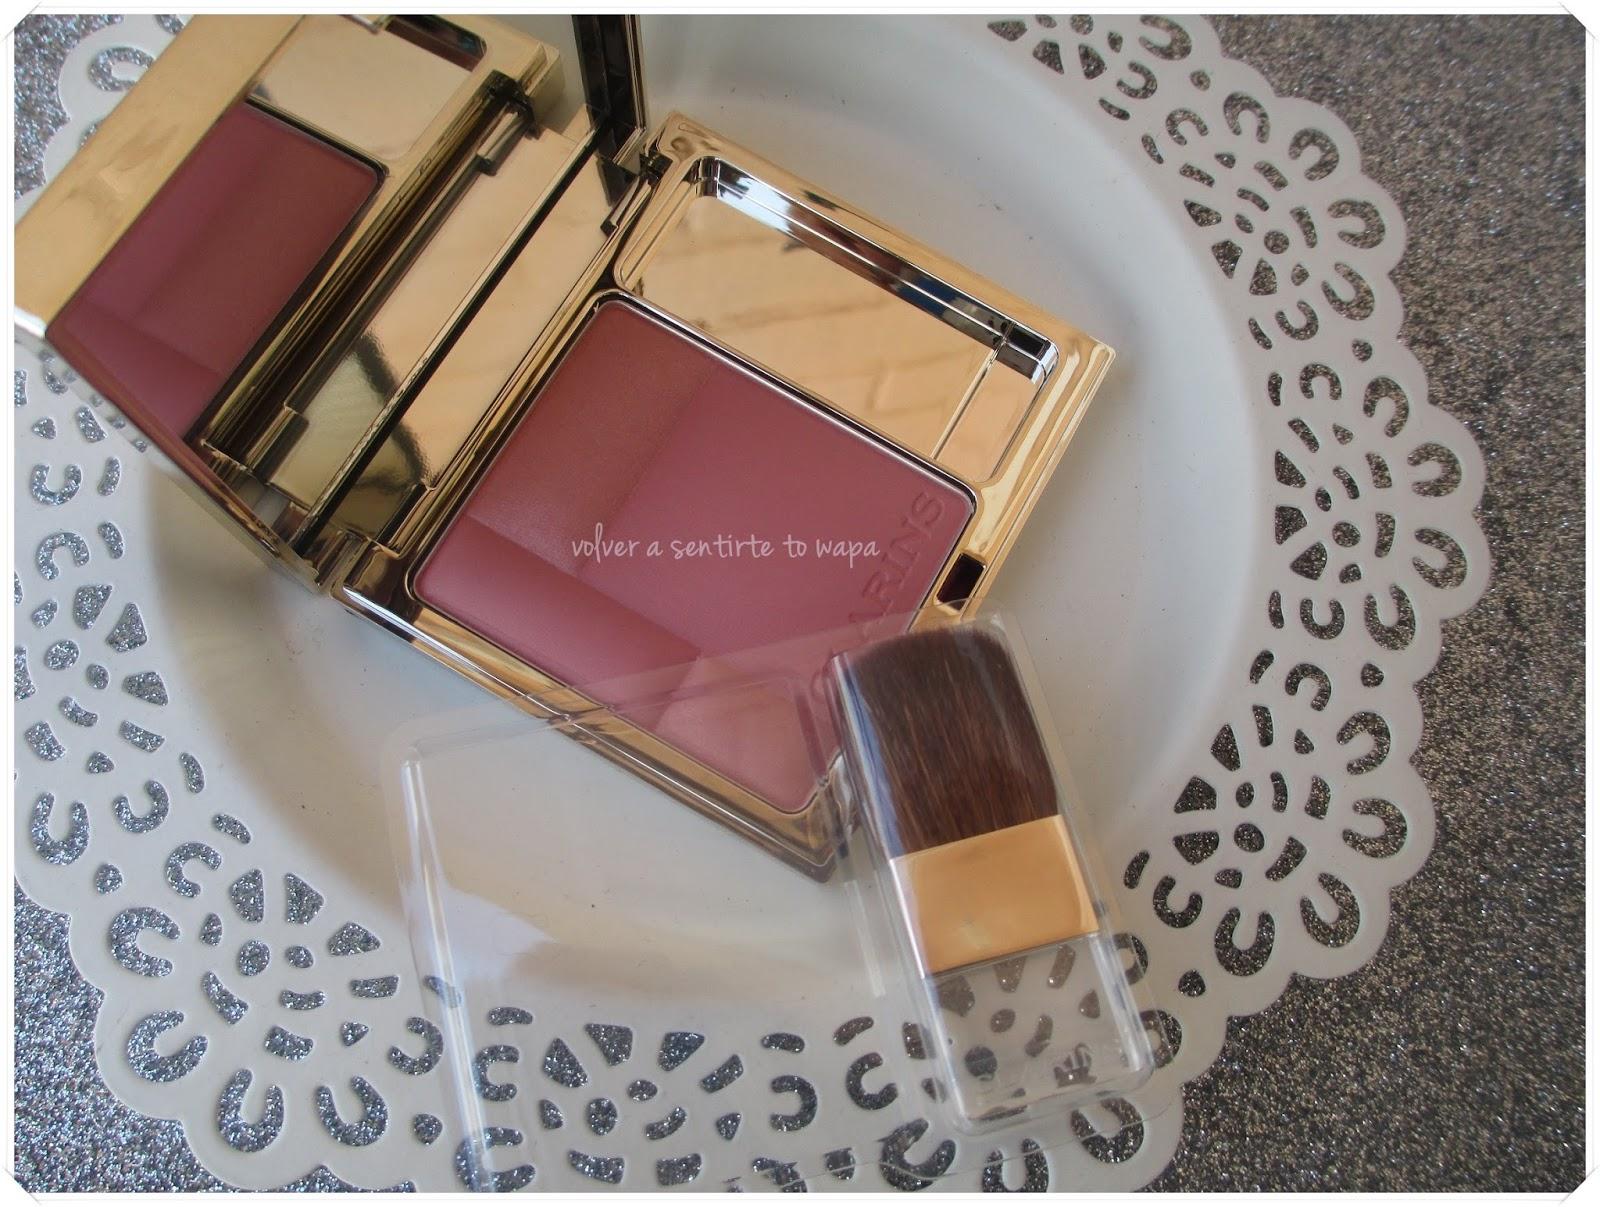 Clarins - Blush Prodige 08 Sweet Rose